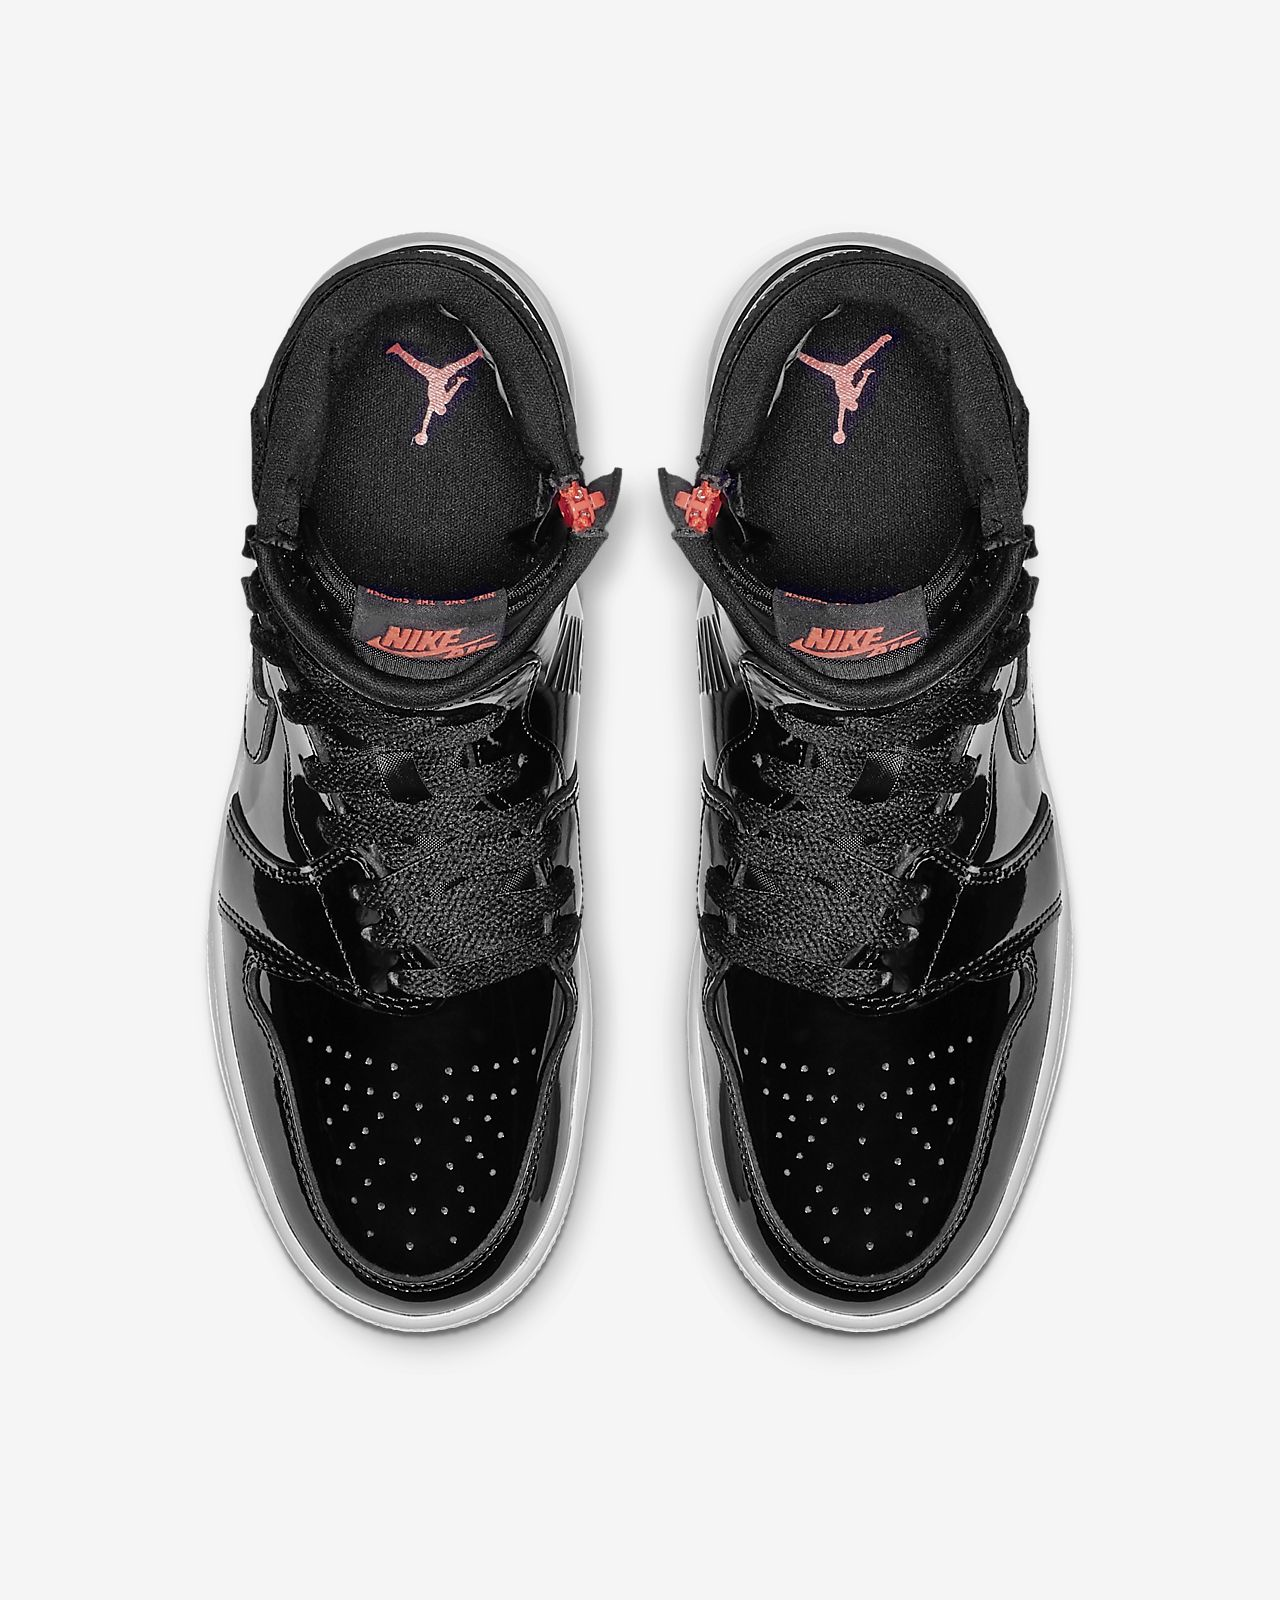 85272aca70a5 Air Jordan 1 Rebel XX Women s Shoe. Nike.com